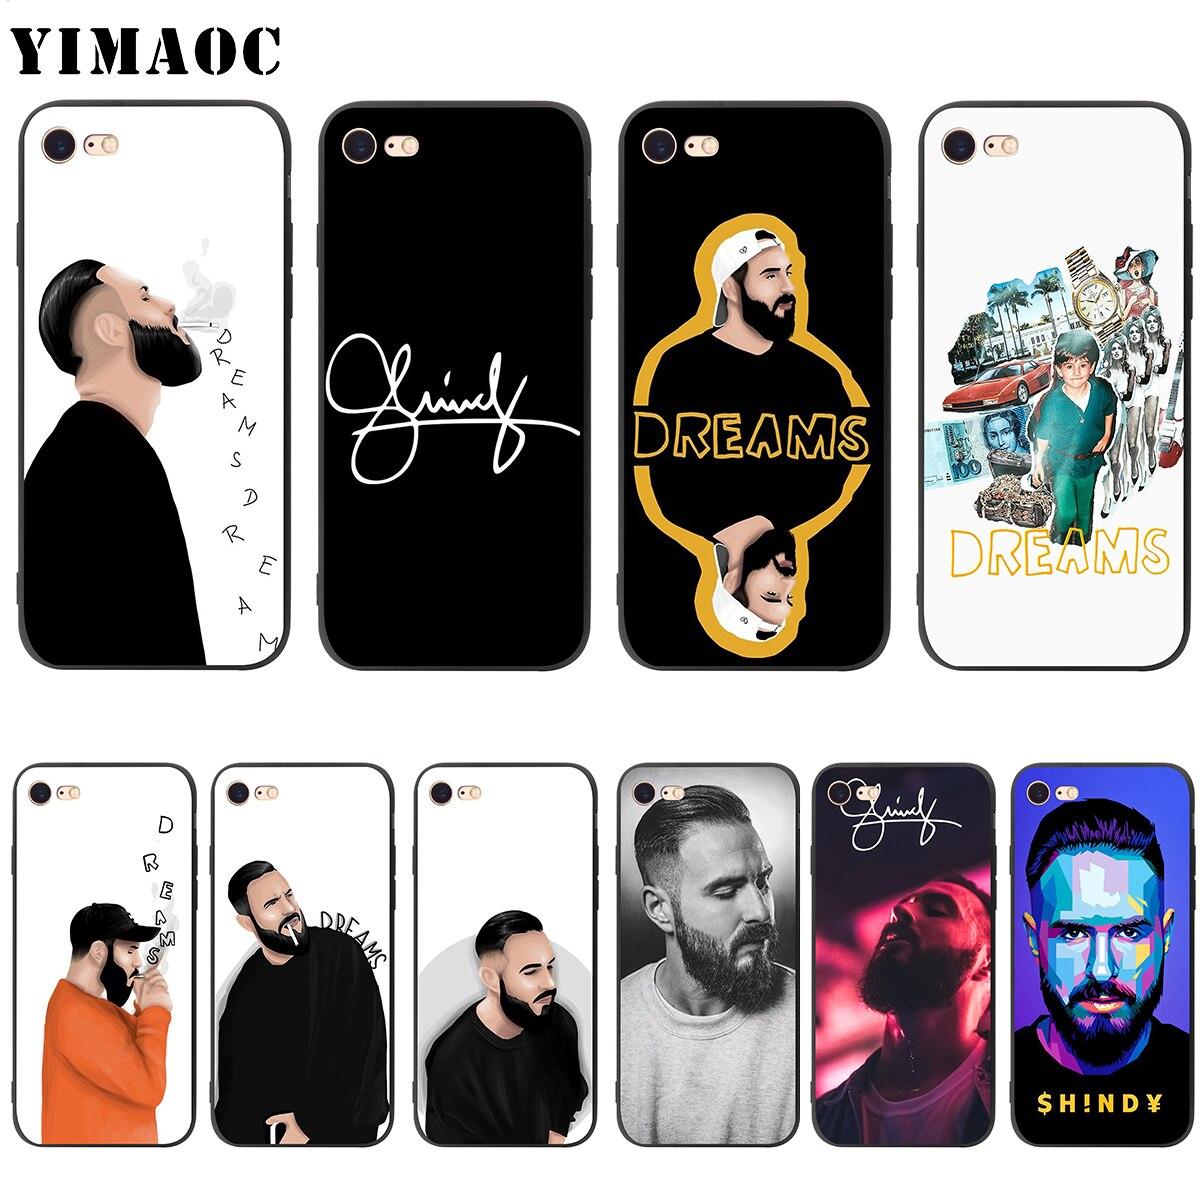 Мягкий силиконовый чехол YIMAOC Shindy Michael Schindler для iPhone 11 Pro XS Max XR X 8 7 6 6S Plus 5 5S se